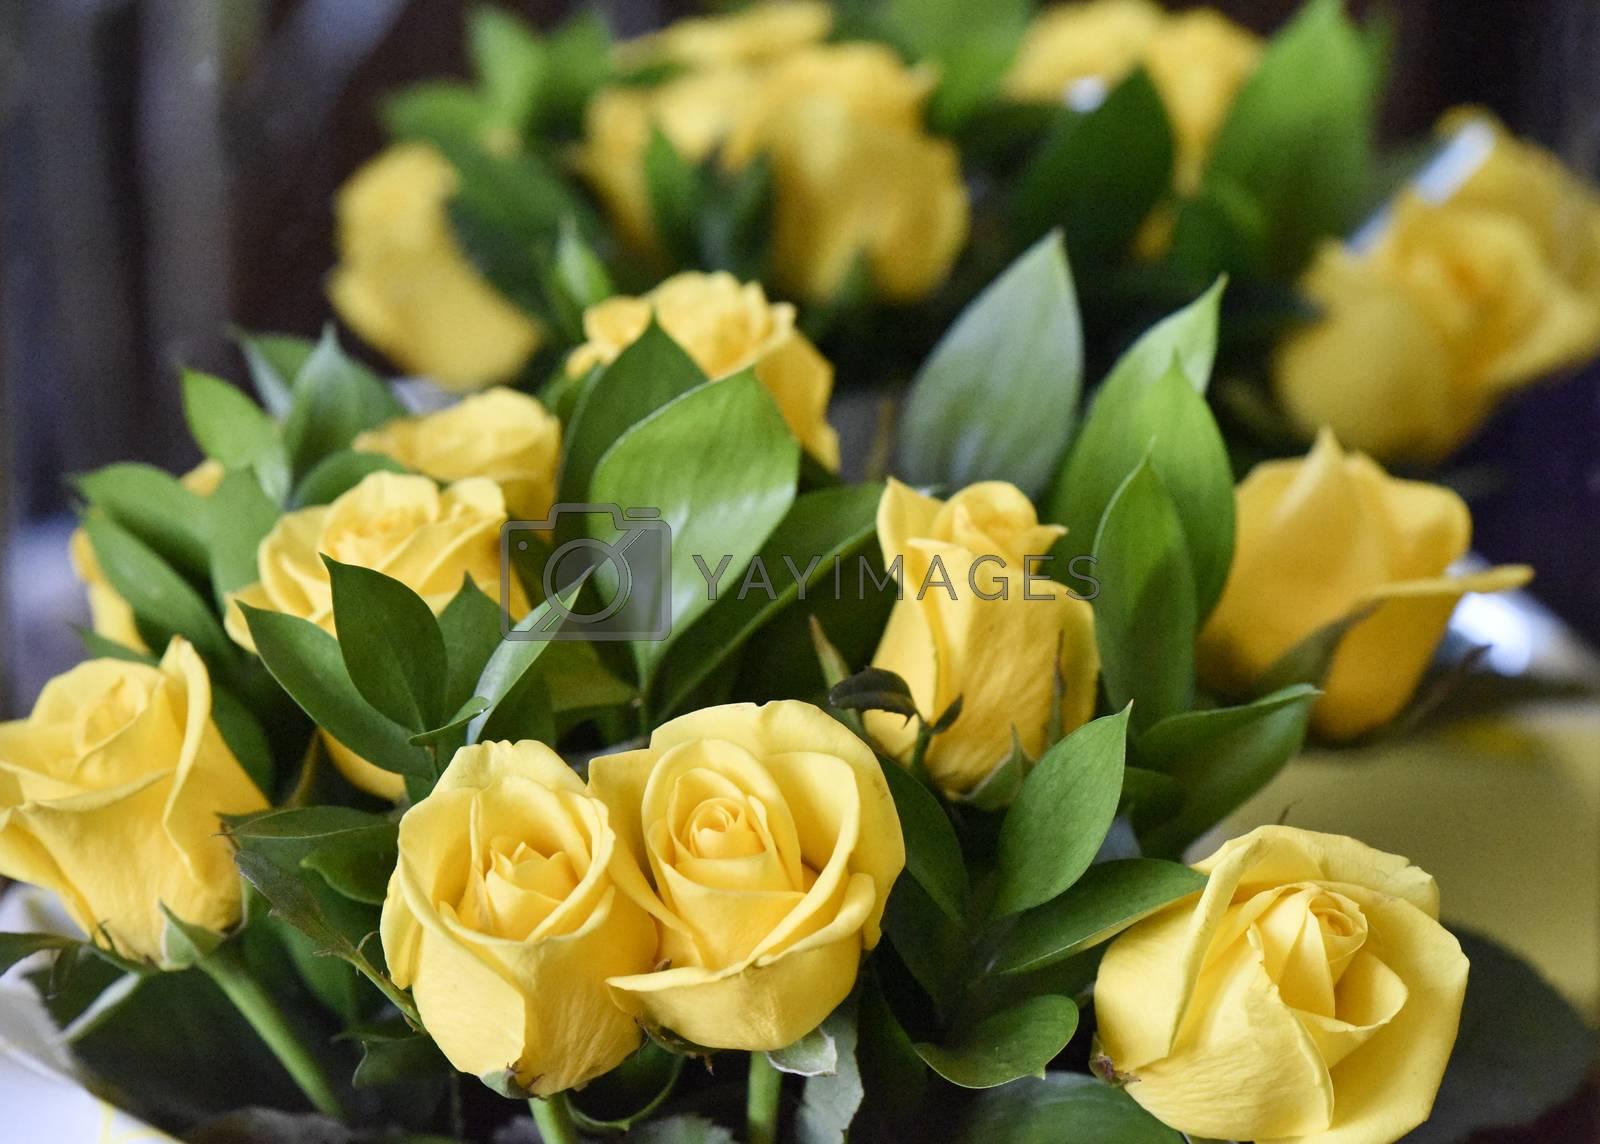 Bouquet of yellow roses, studio shot. Selective focus. Romance concept.